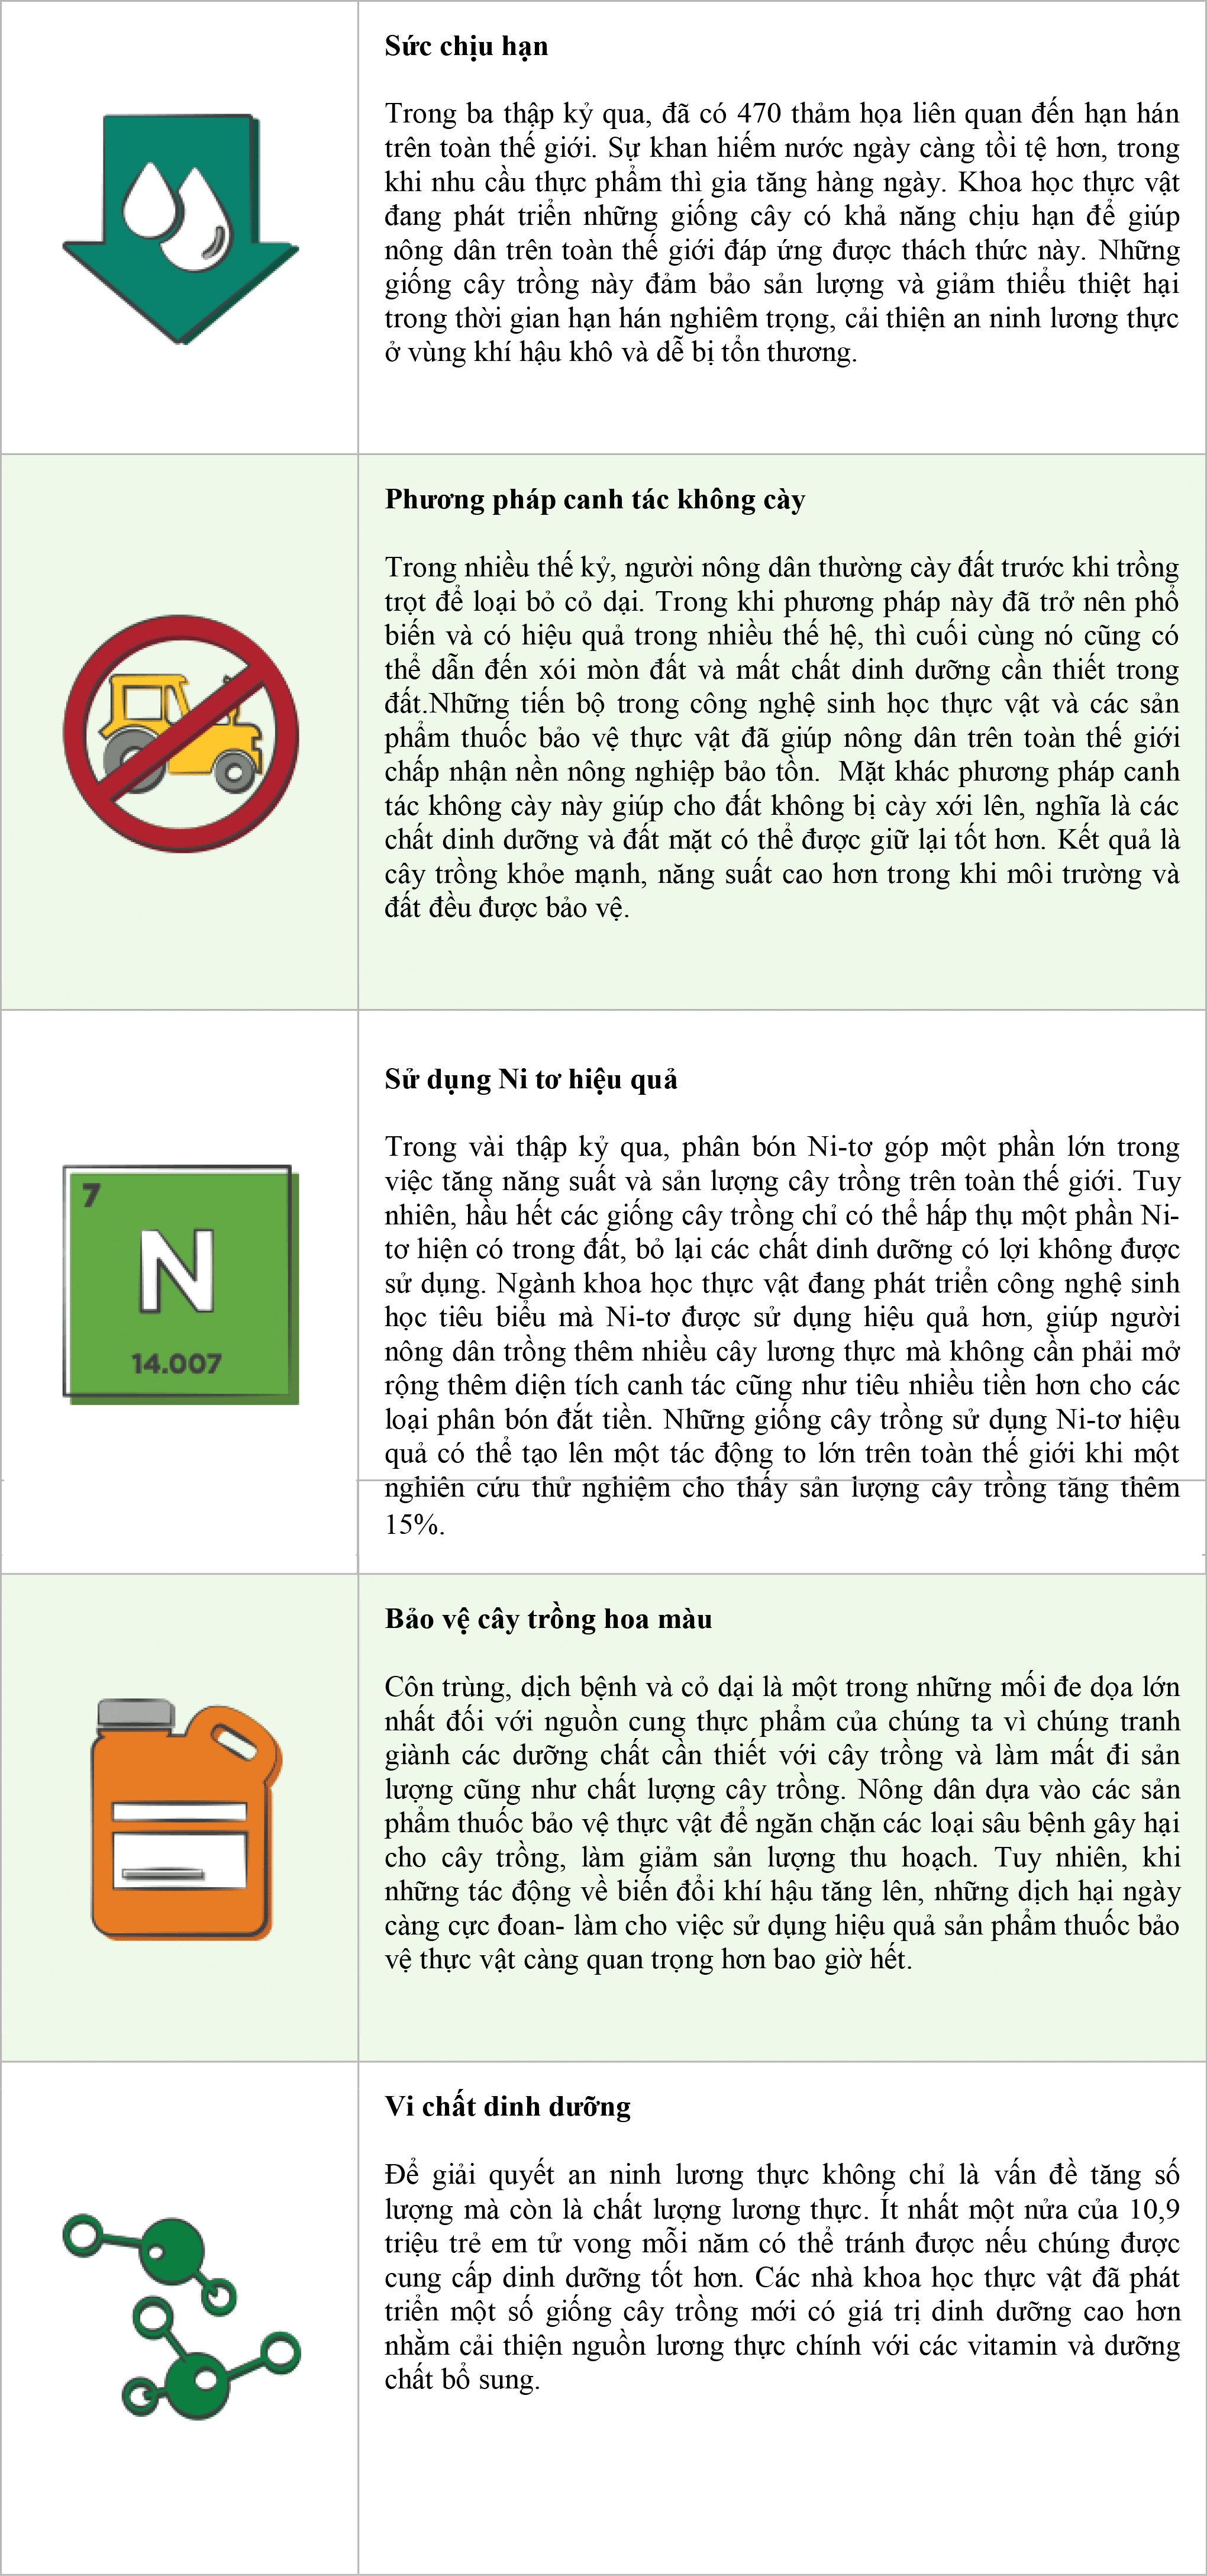 5 giai phap nong nghiep ho tro an ninh luong thuc